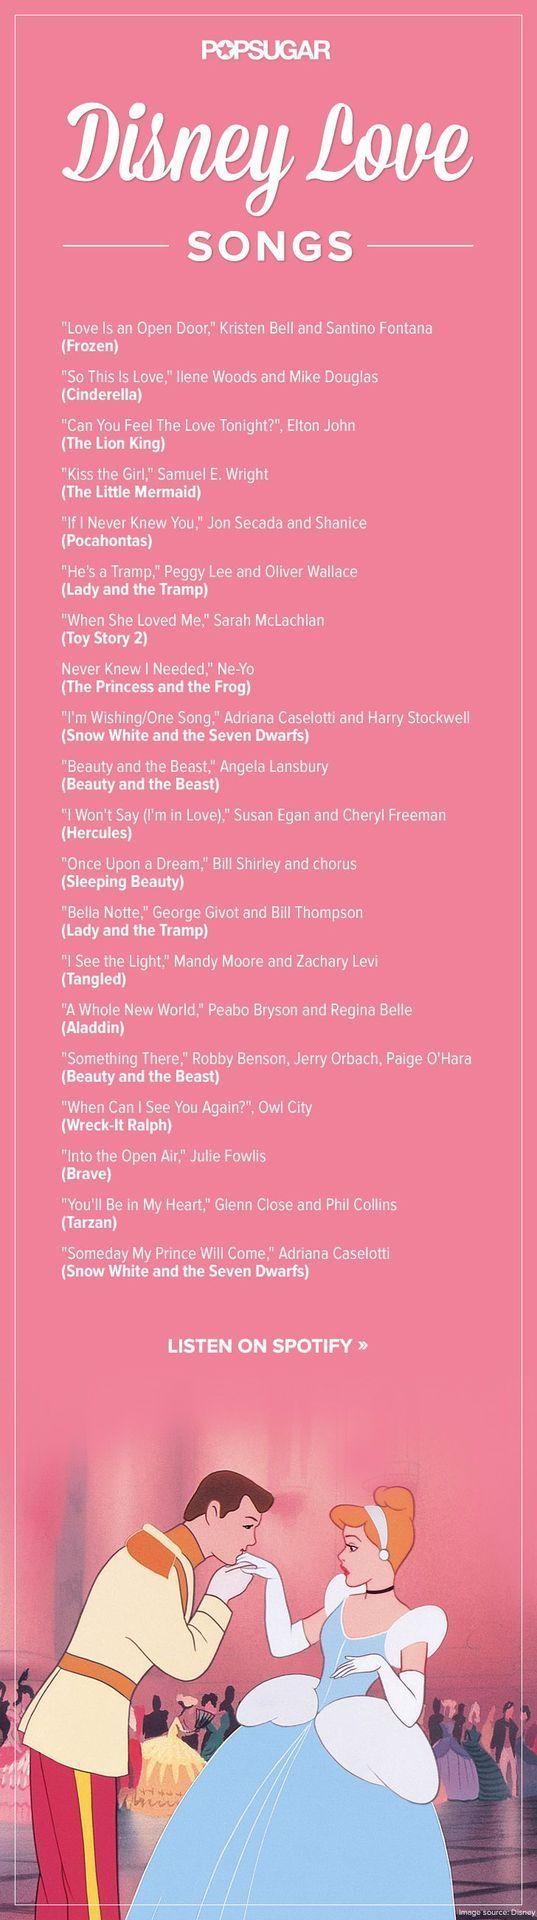 Disney Love Songs. For Disney weddings